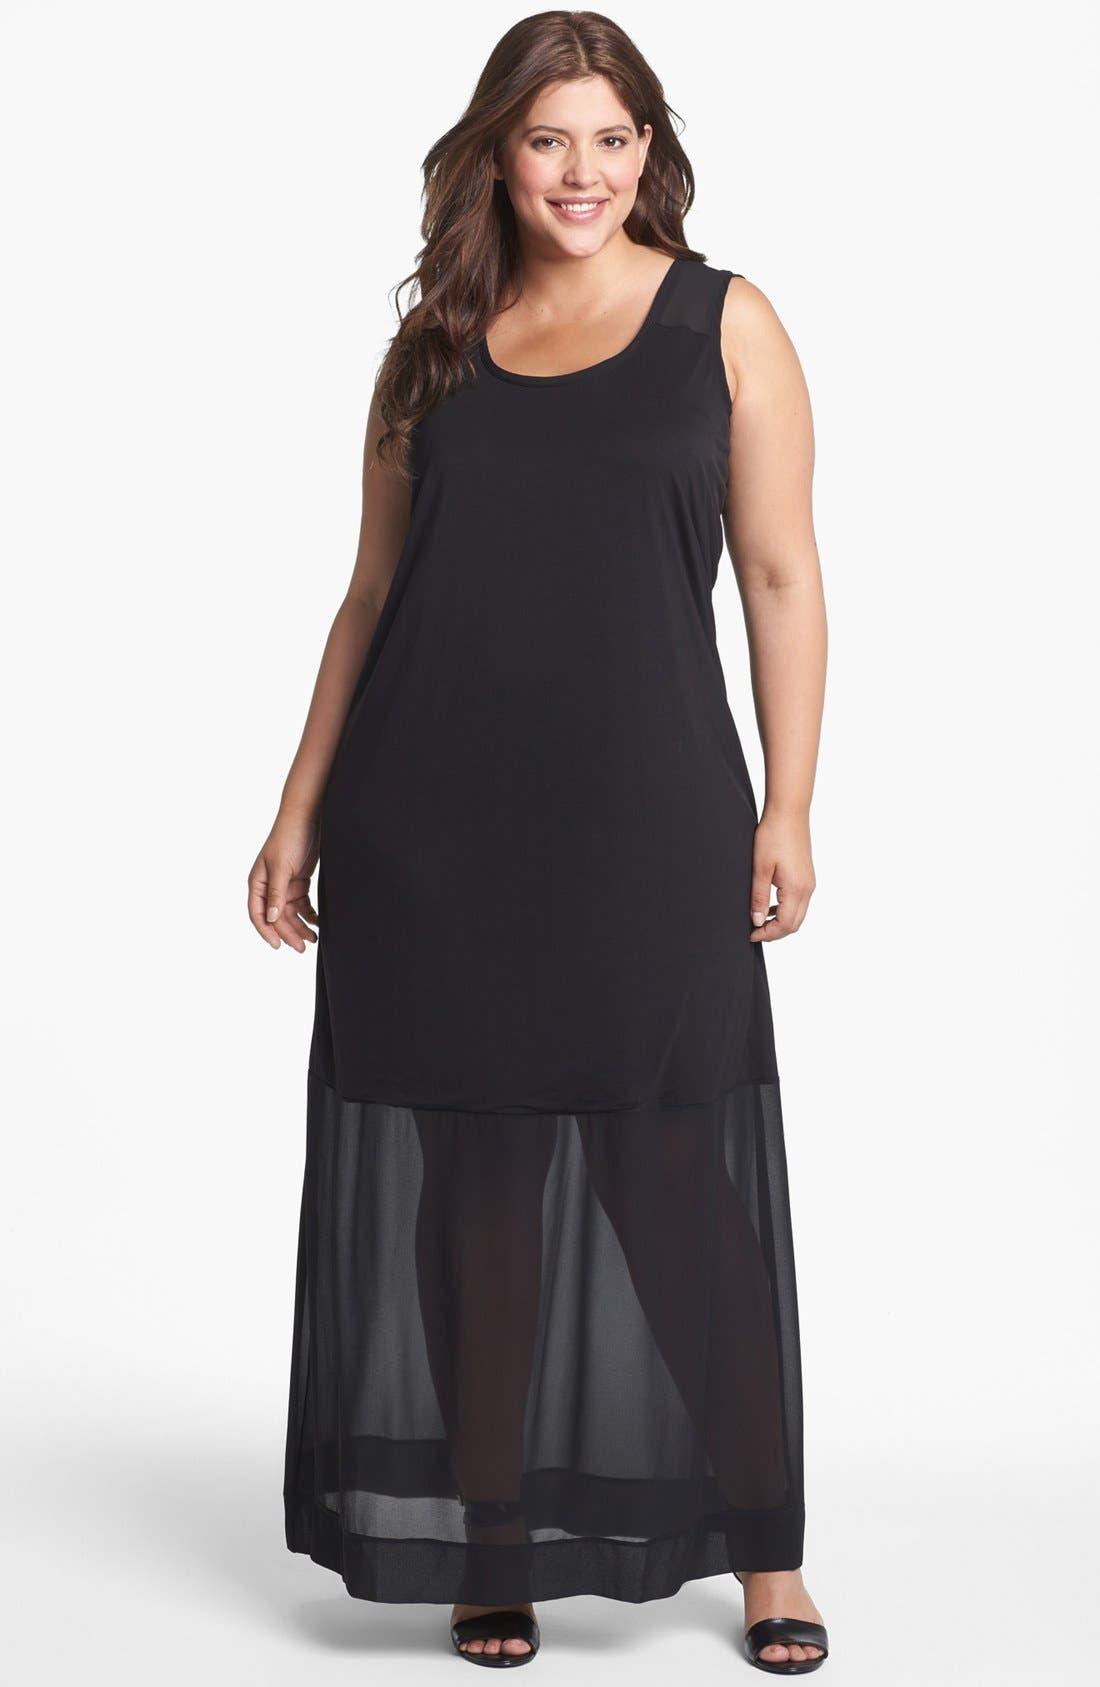 Alternate Image 1 Selected - DKNYC Mixed Media Maxi Dress (Plus Size)